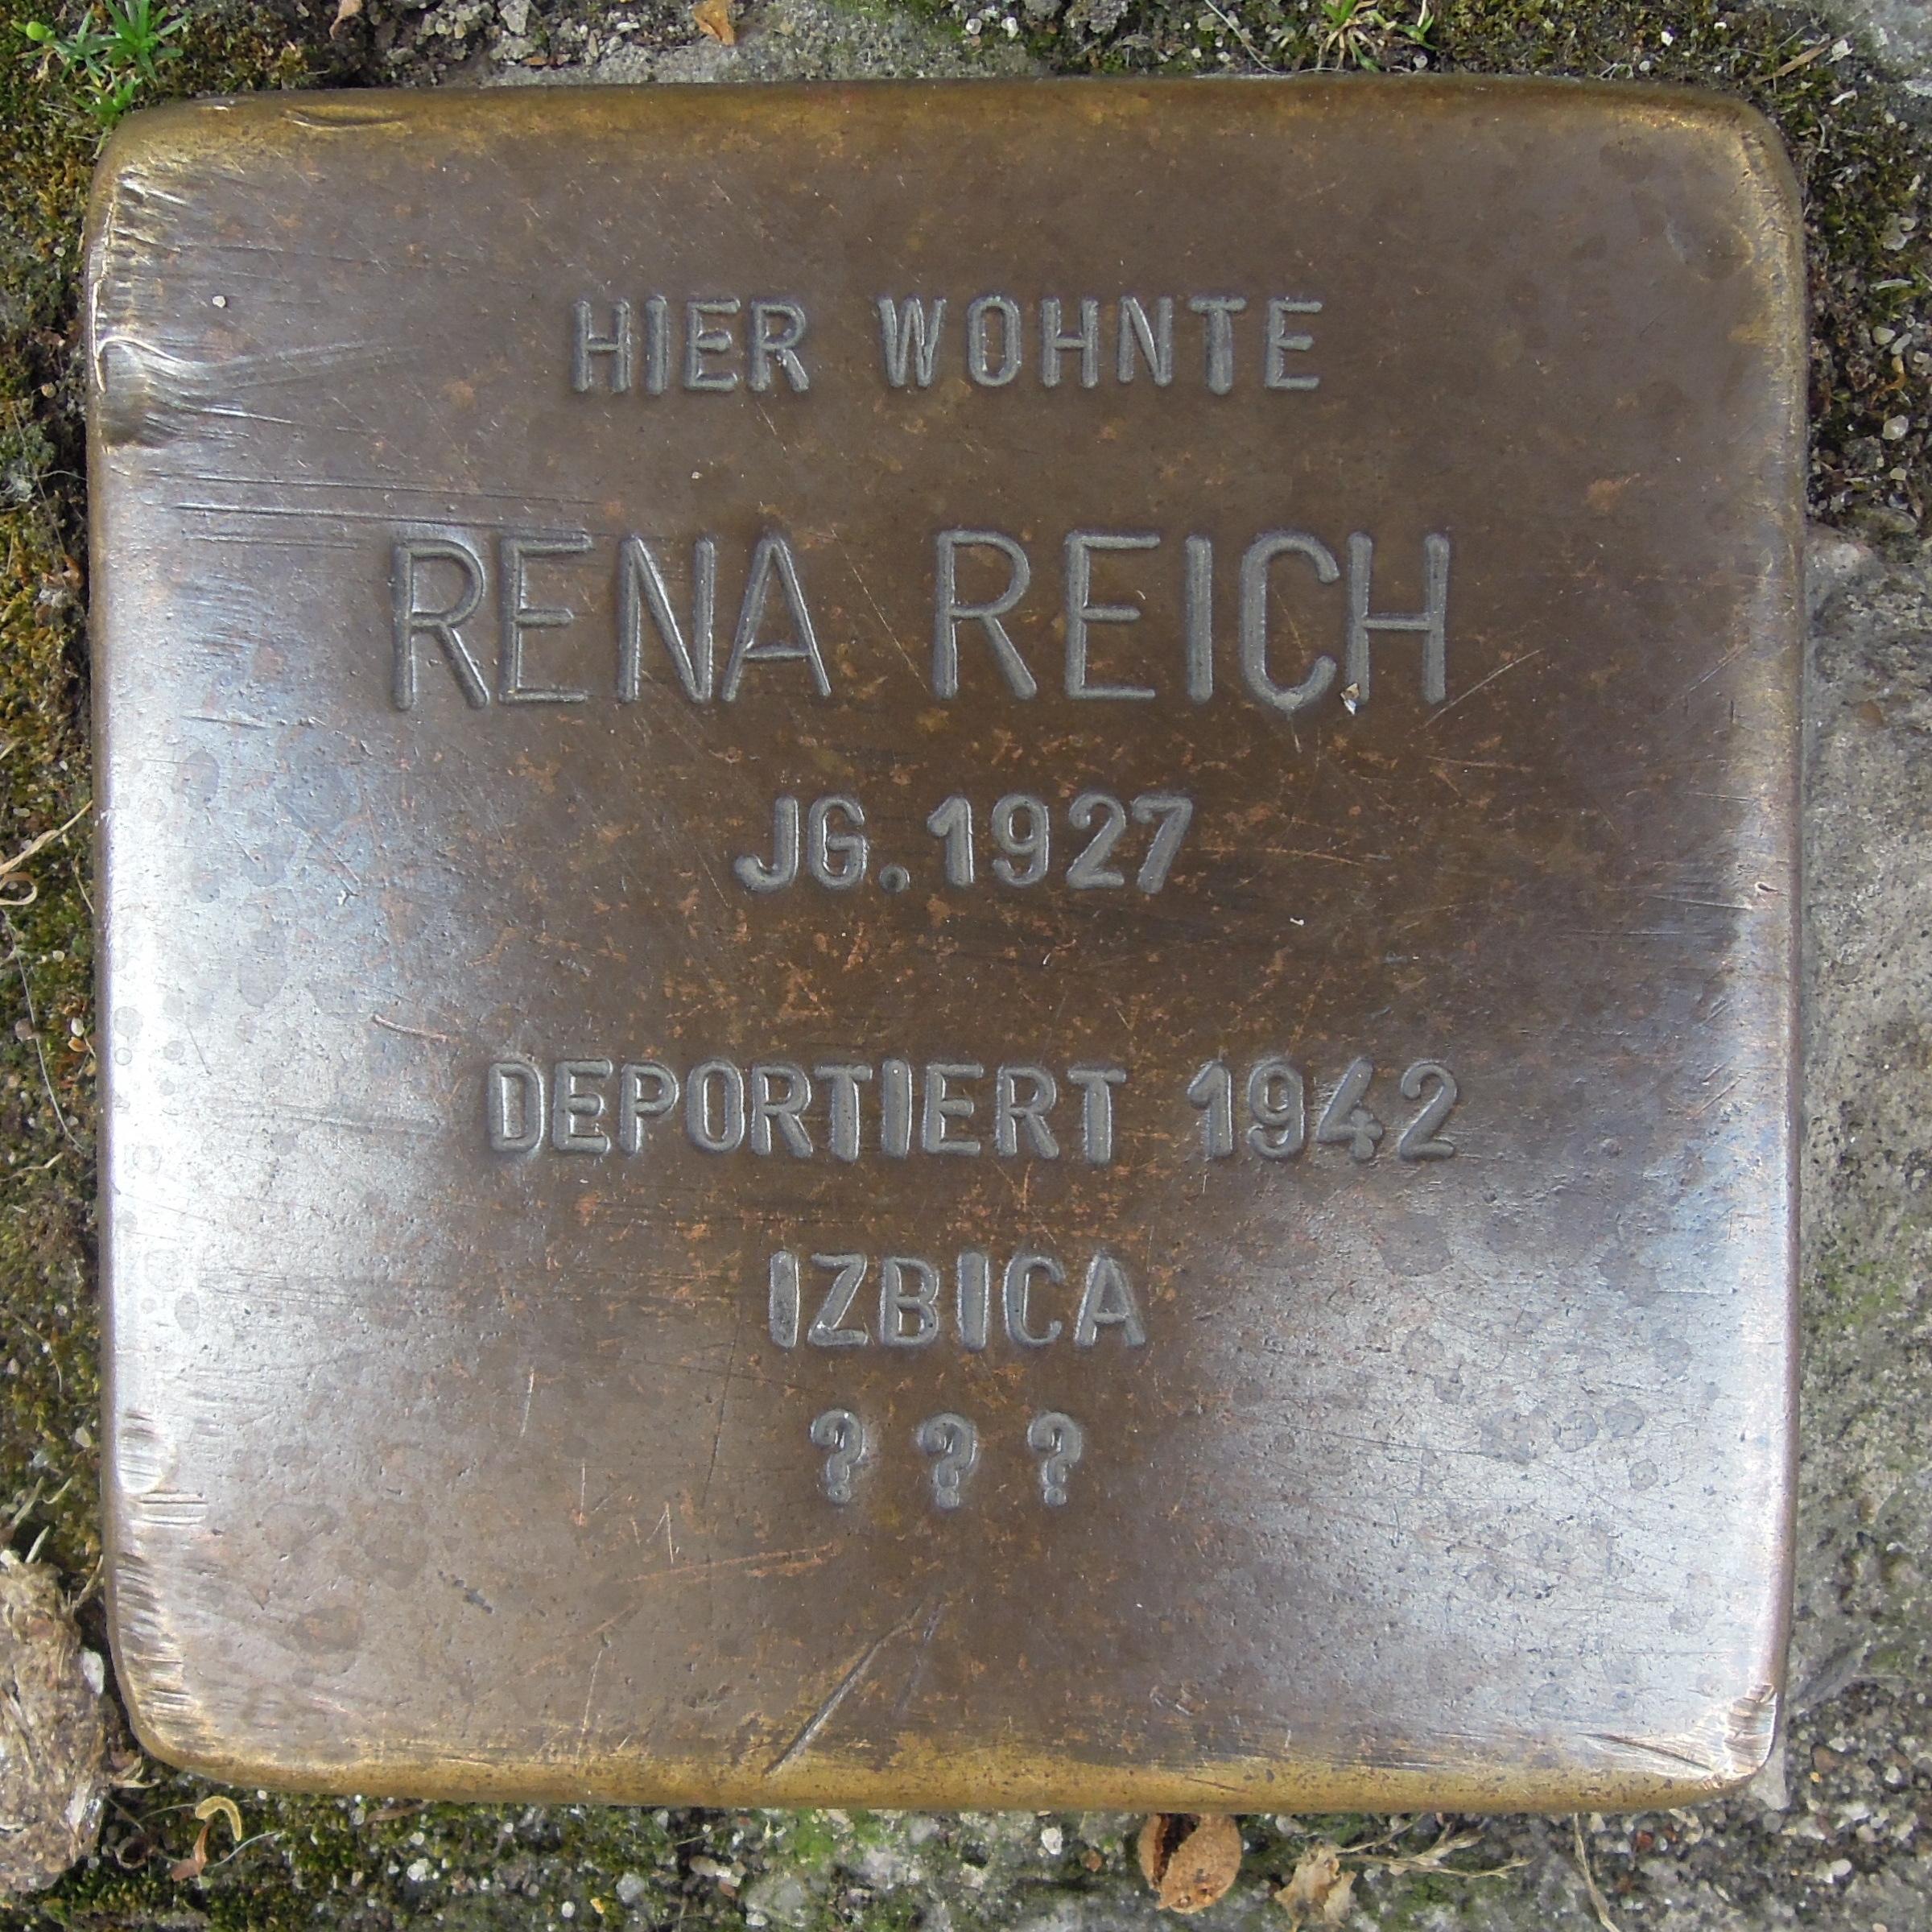 https://upload.wikimedia.org/wikipedia/commons/5/5e/Stolperstein_Kitzingen_Schweizer_Gasse_2_Rena_Reich.jpg